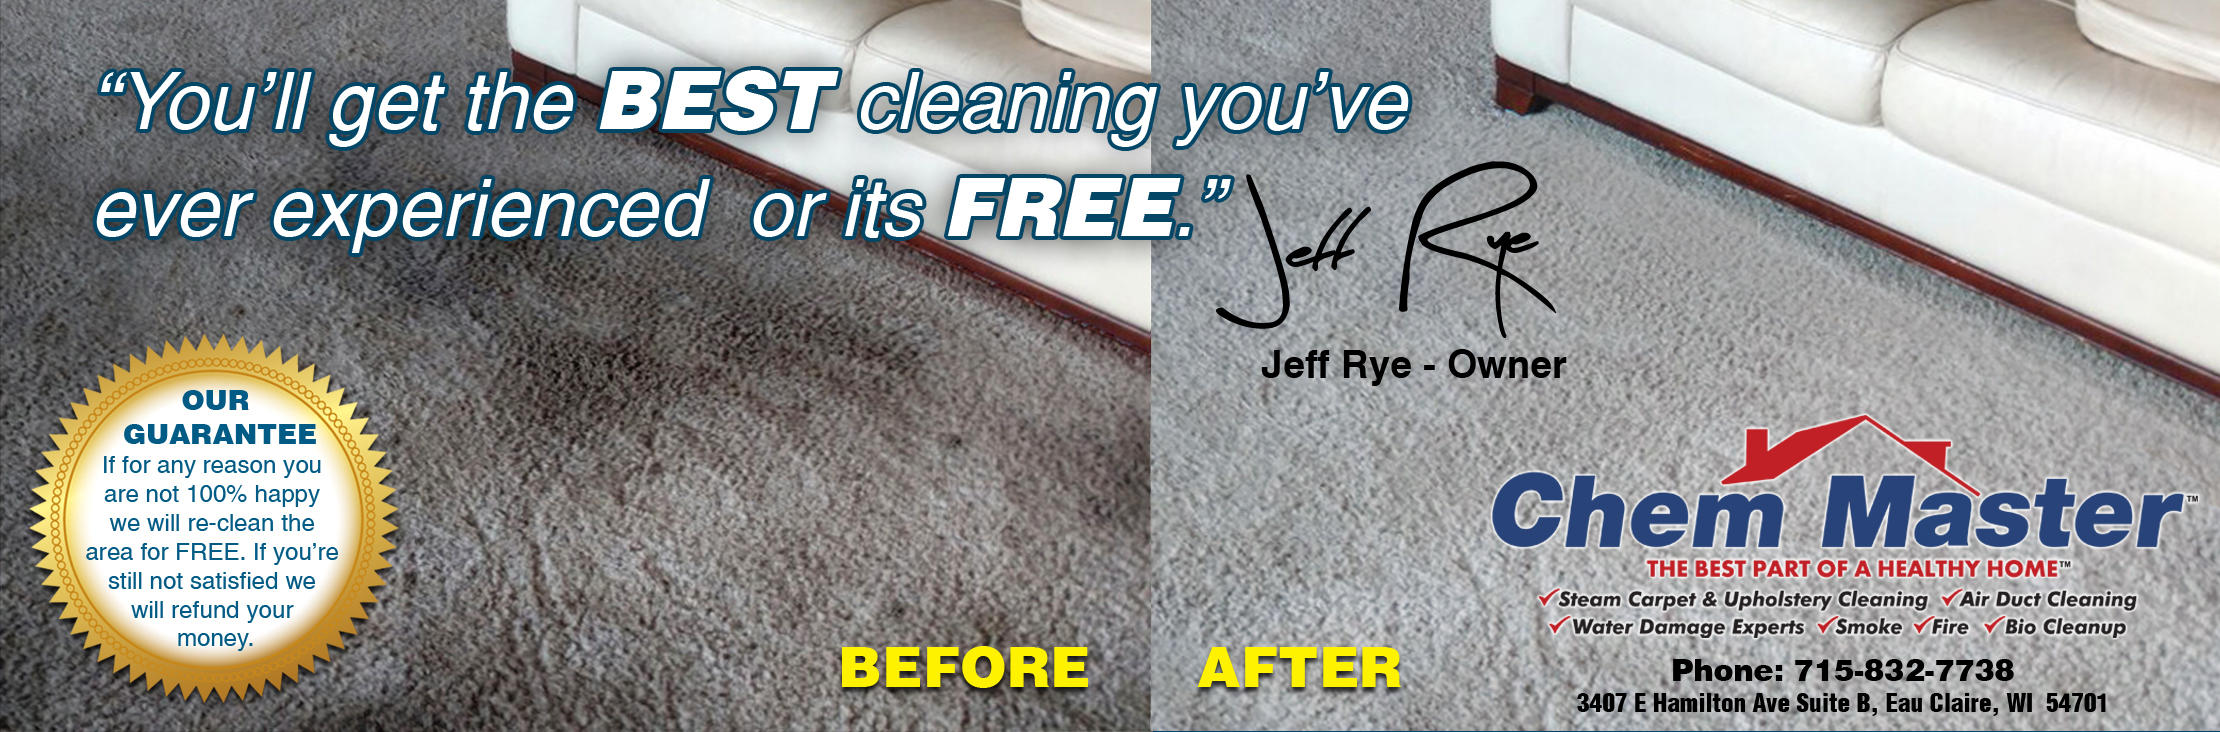 Chem Master Carpet Cleaning And Restoration image 5